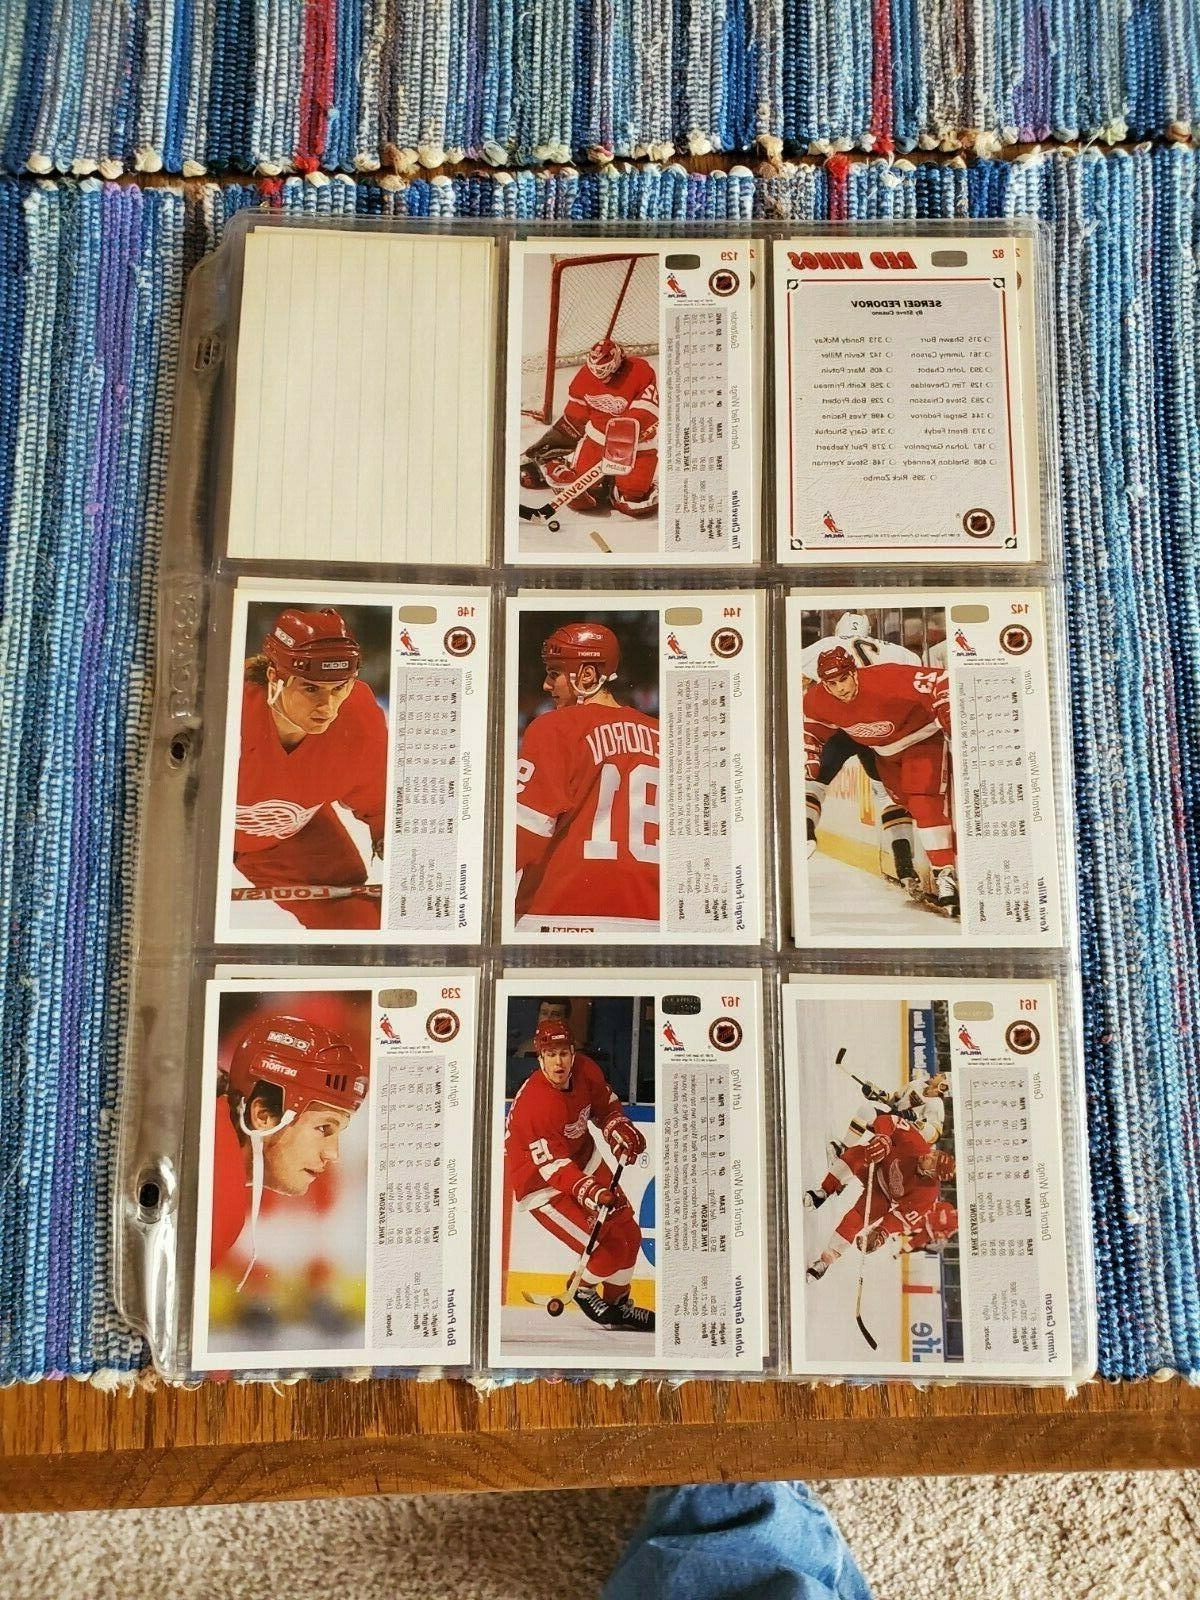 1991-92 Upper Wings cards Mint in sleeves